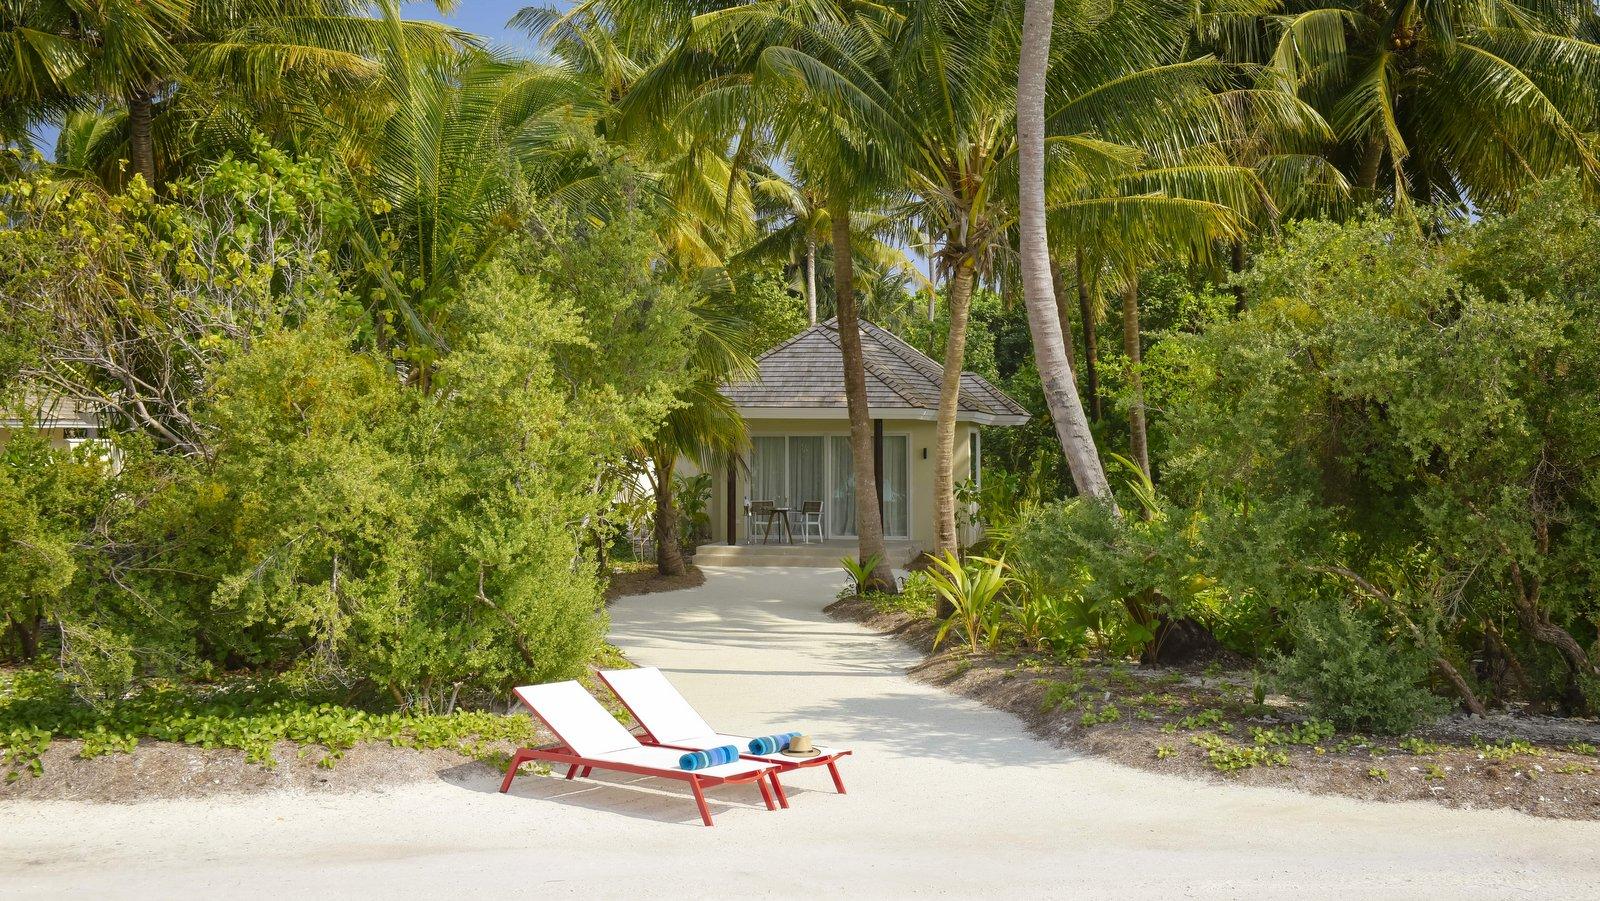 Мальдивы, отель Kandima Maldives, номер Beach Villa with Jacuzzi